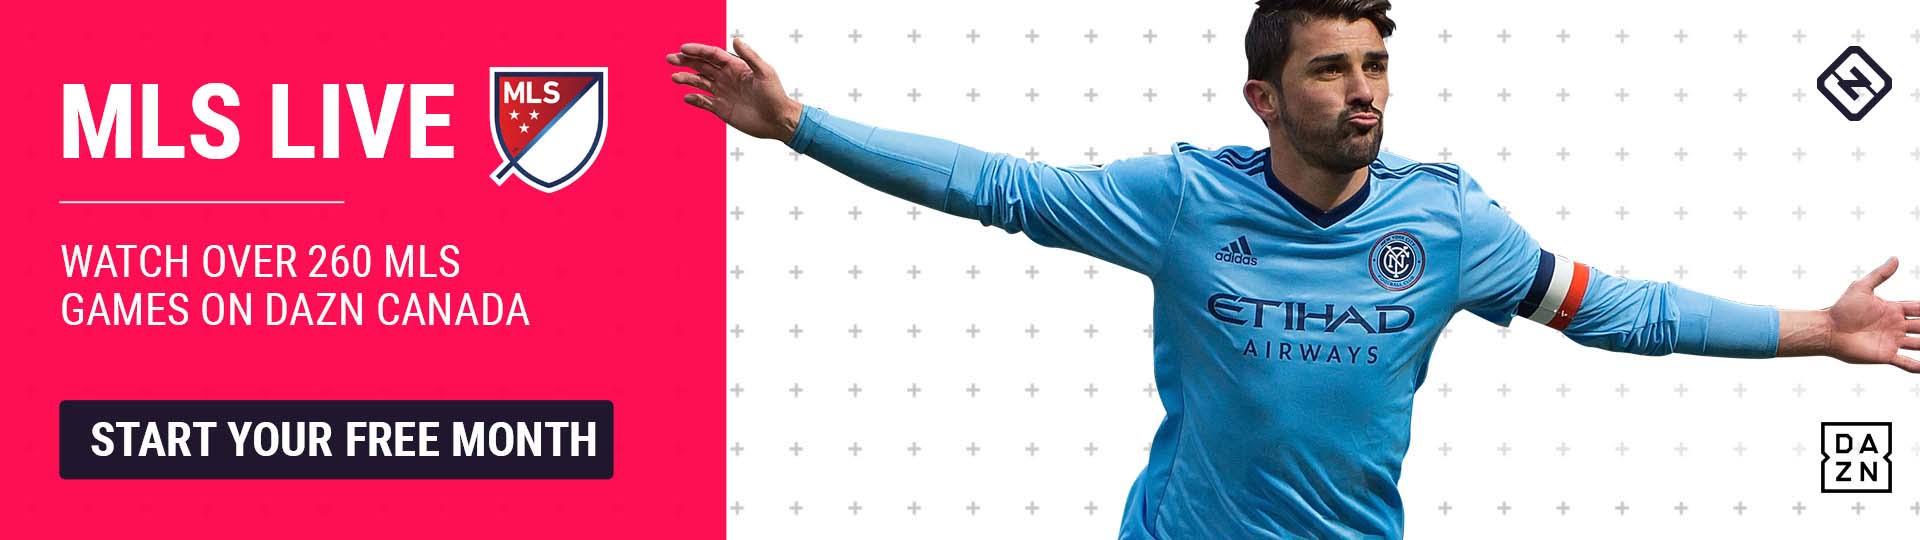 MLS graphic